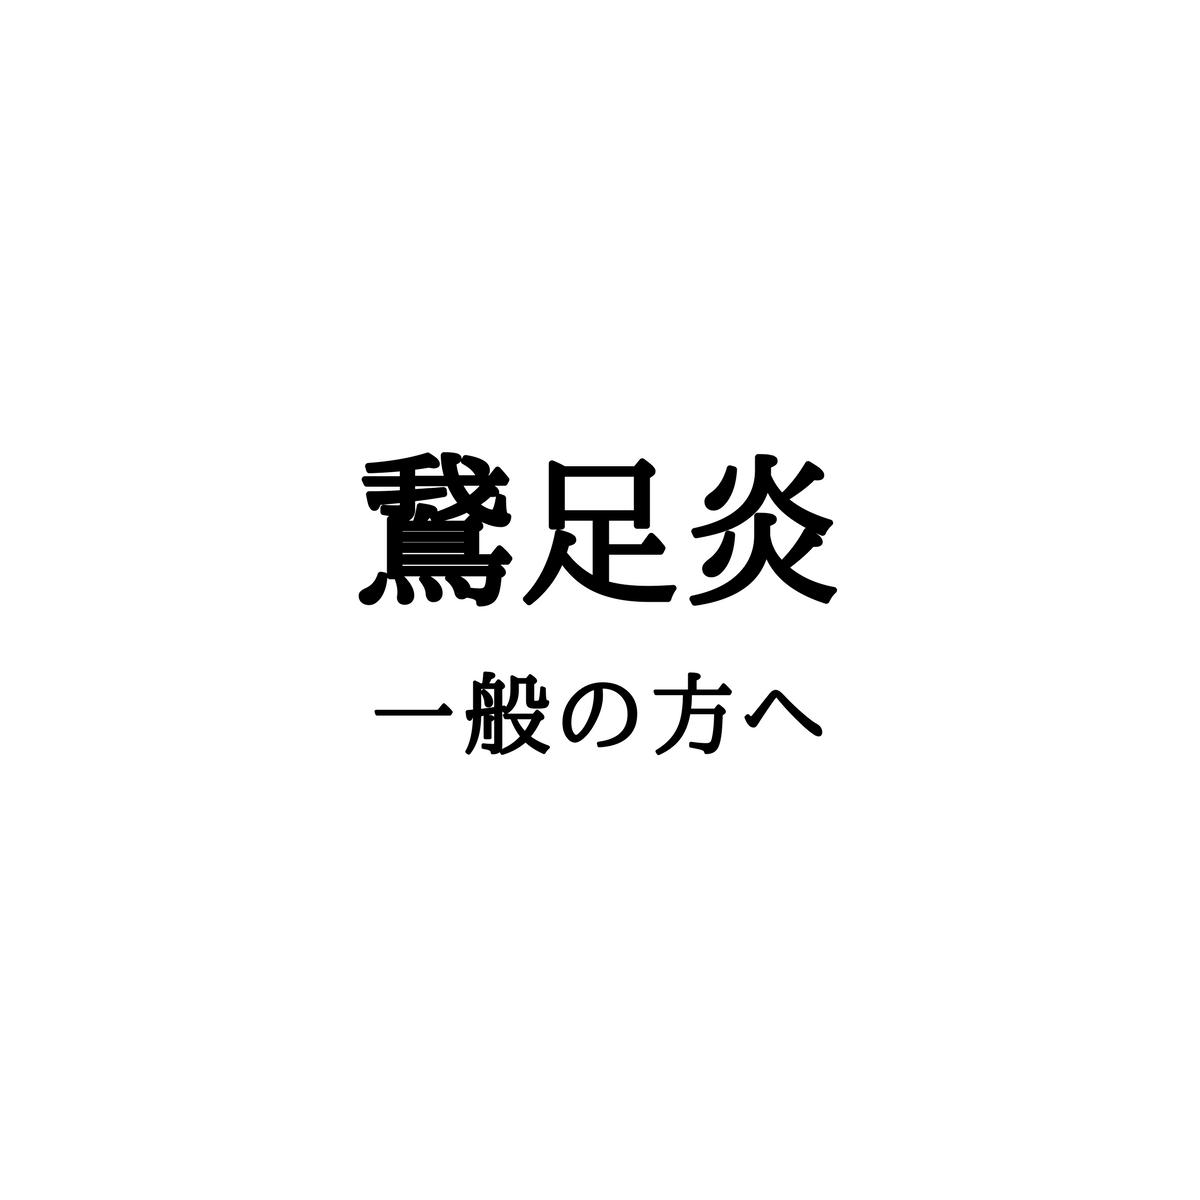 20180109193237